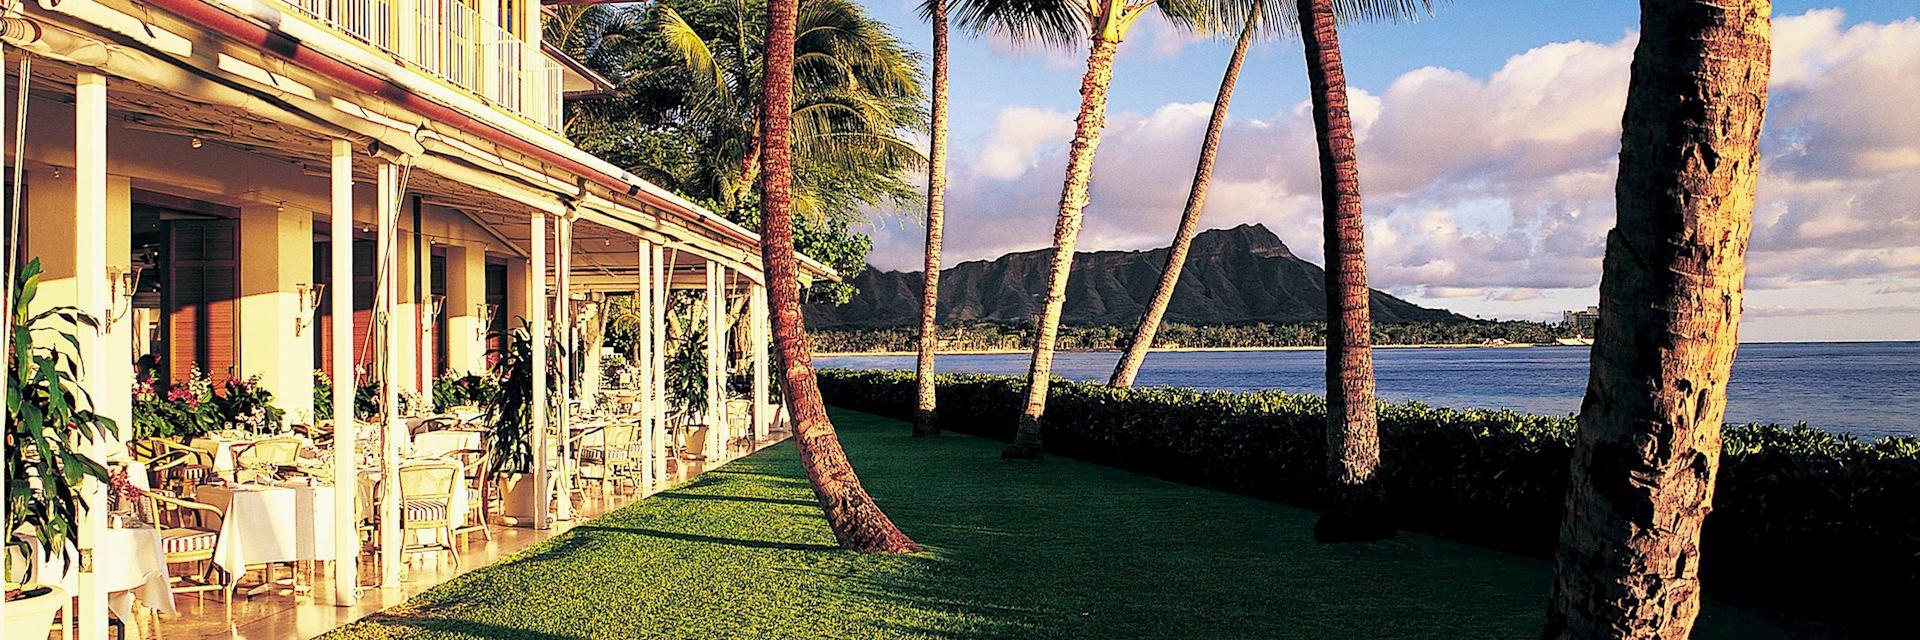 Halekulani Hotel, Oahu